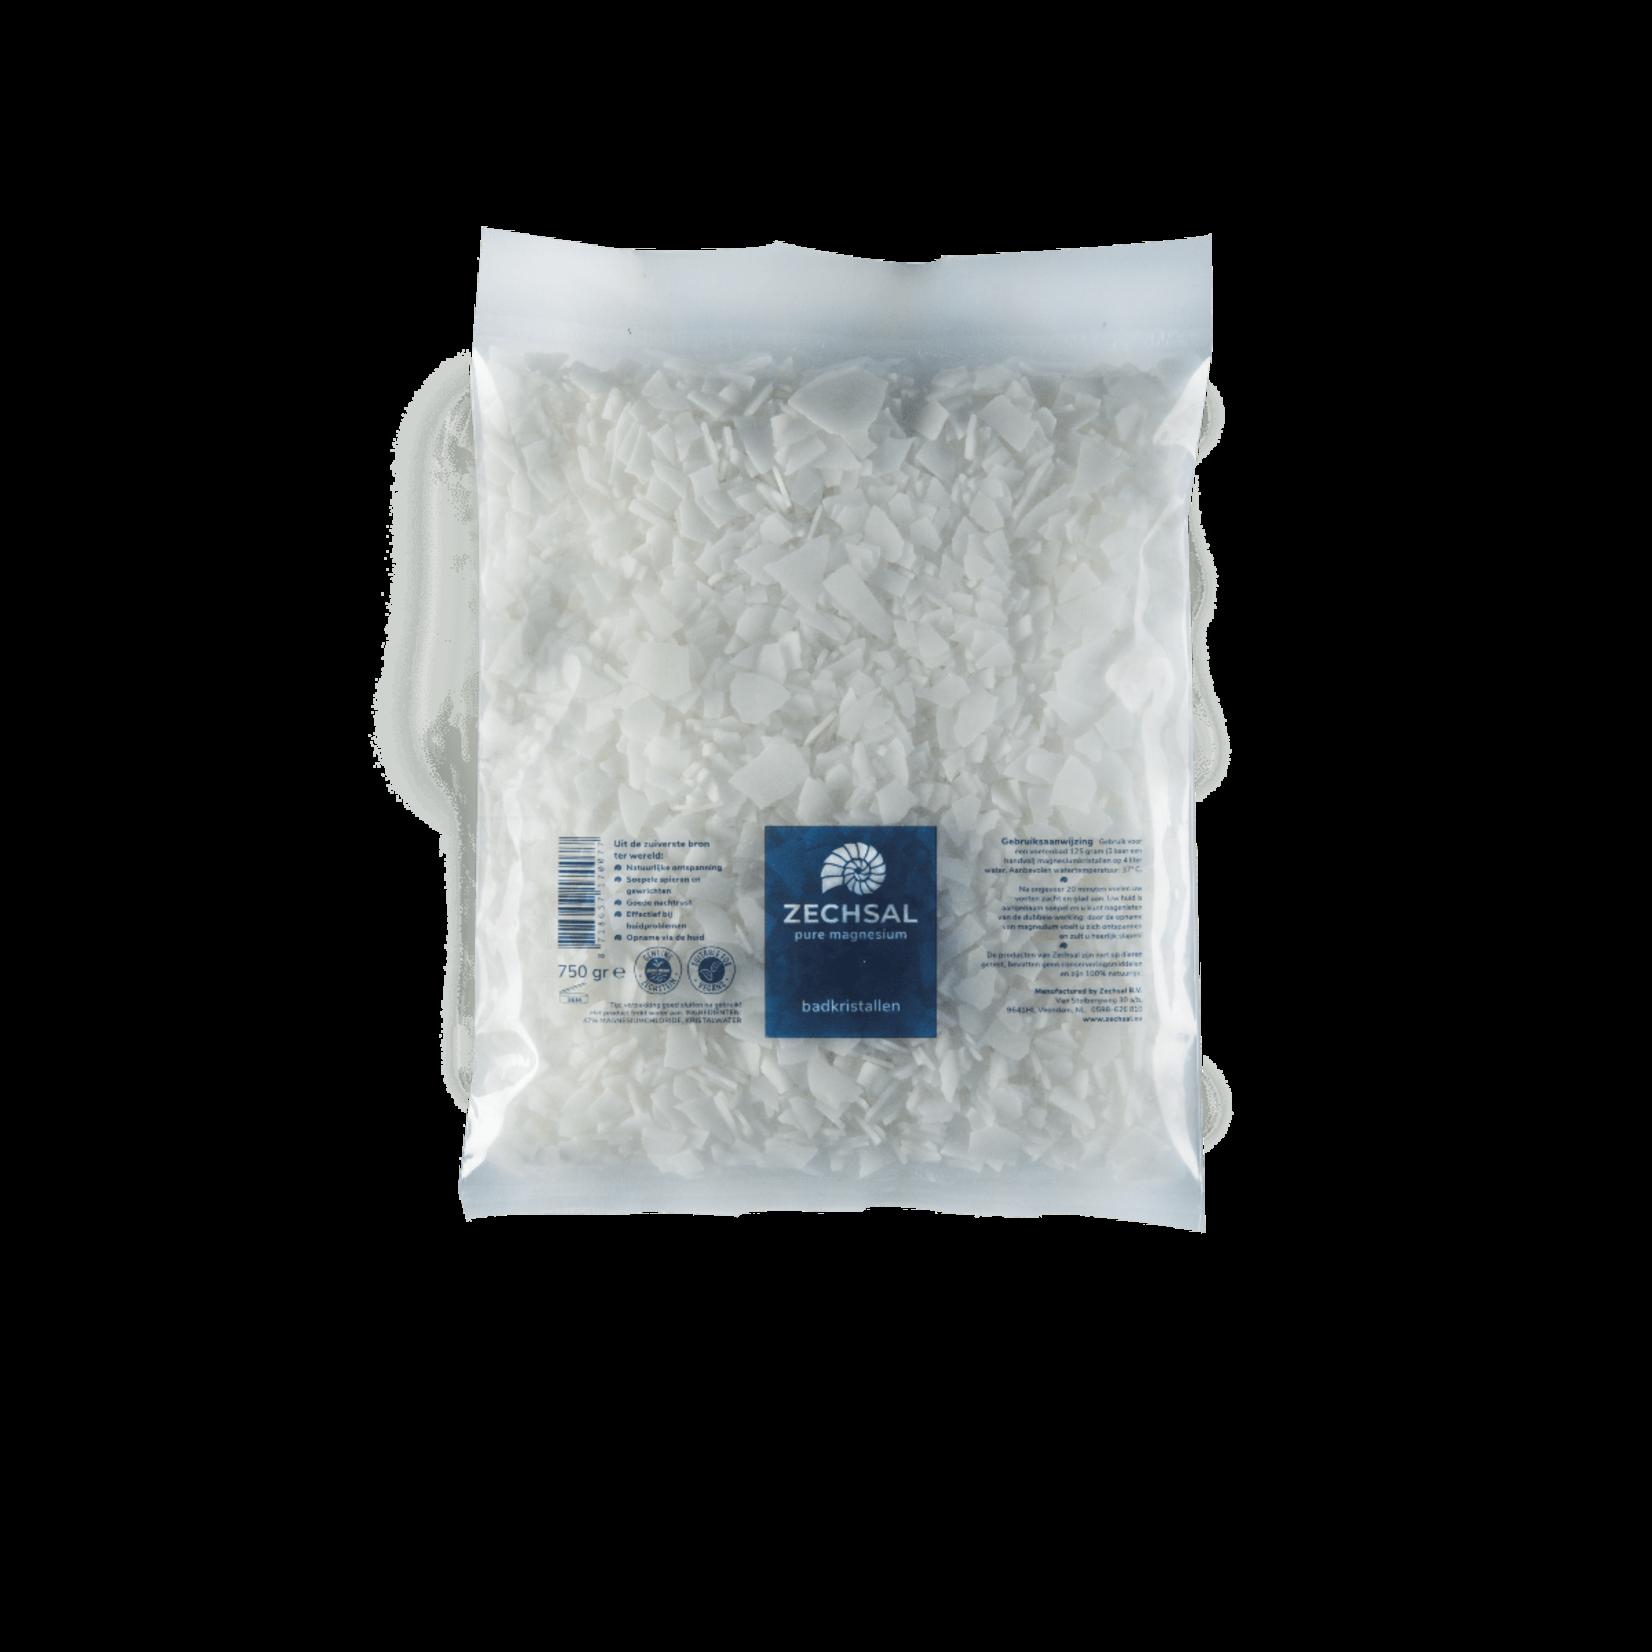 Zechsal Zechsal magnesium navulzakje voetenbad – 750g